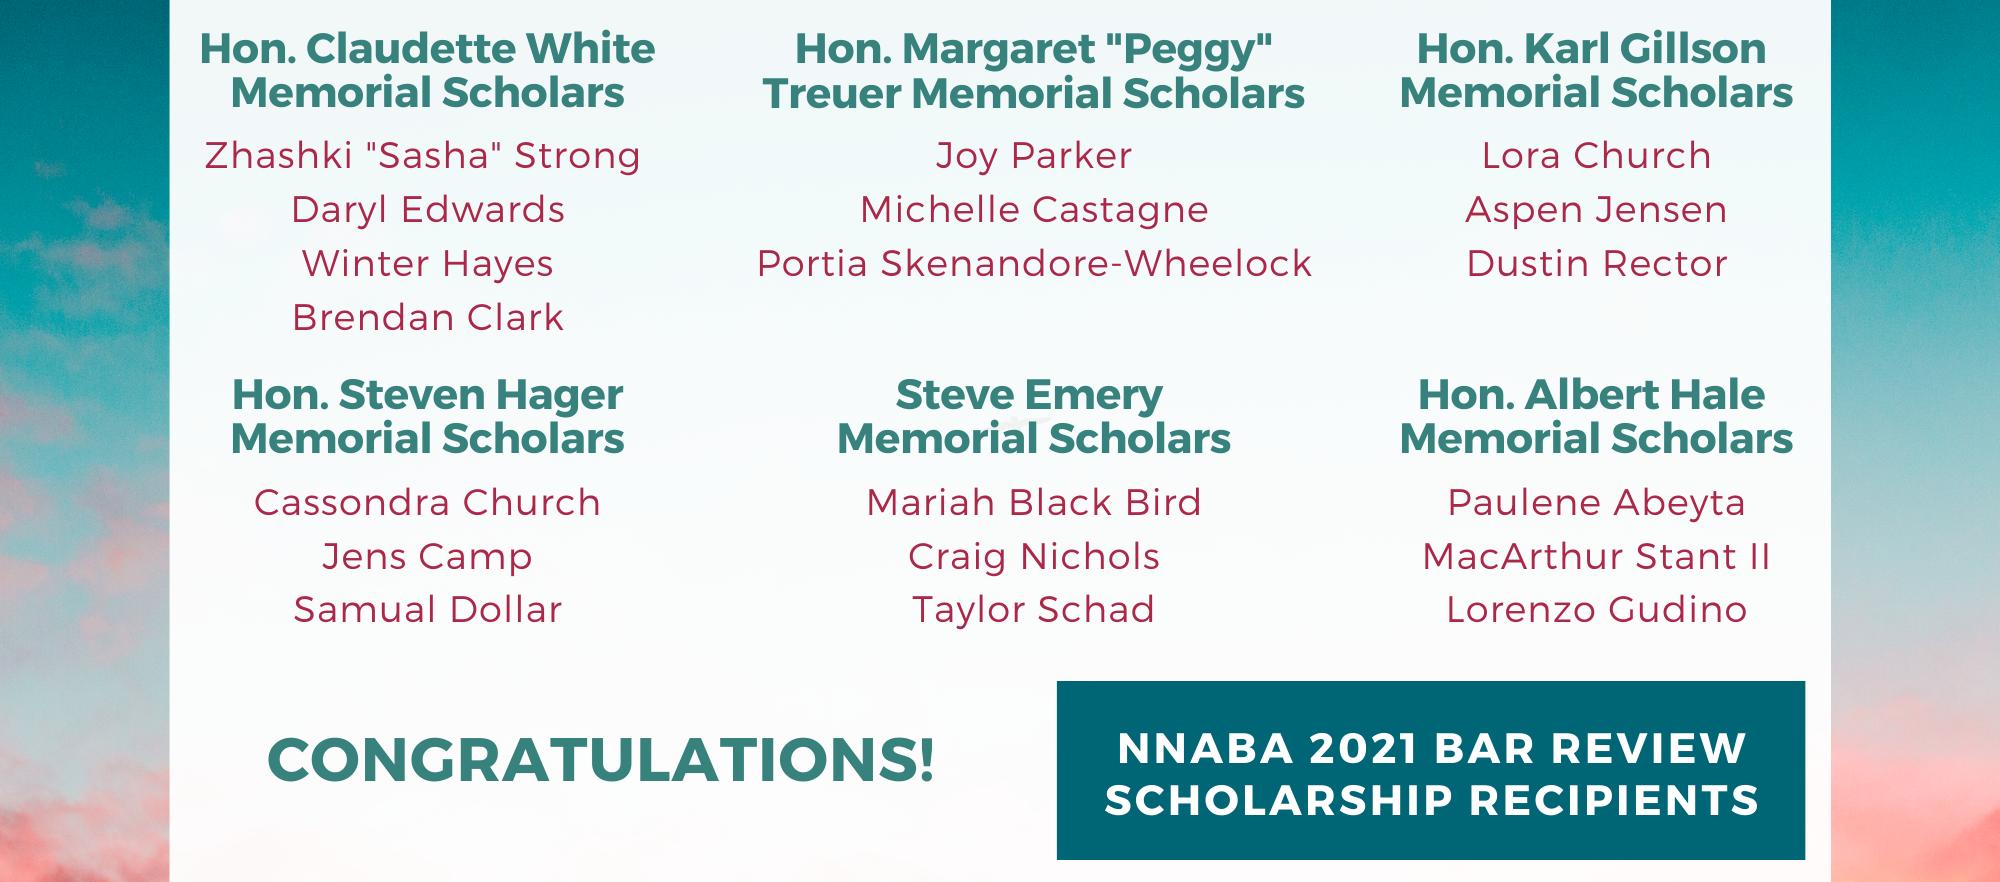 NNABA 2021 Bar Review Scholars